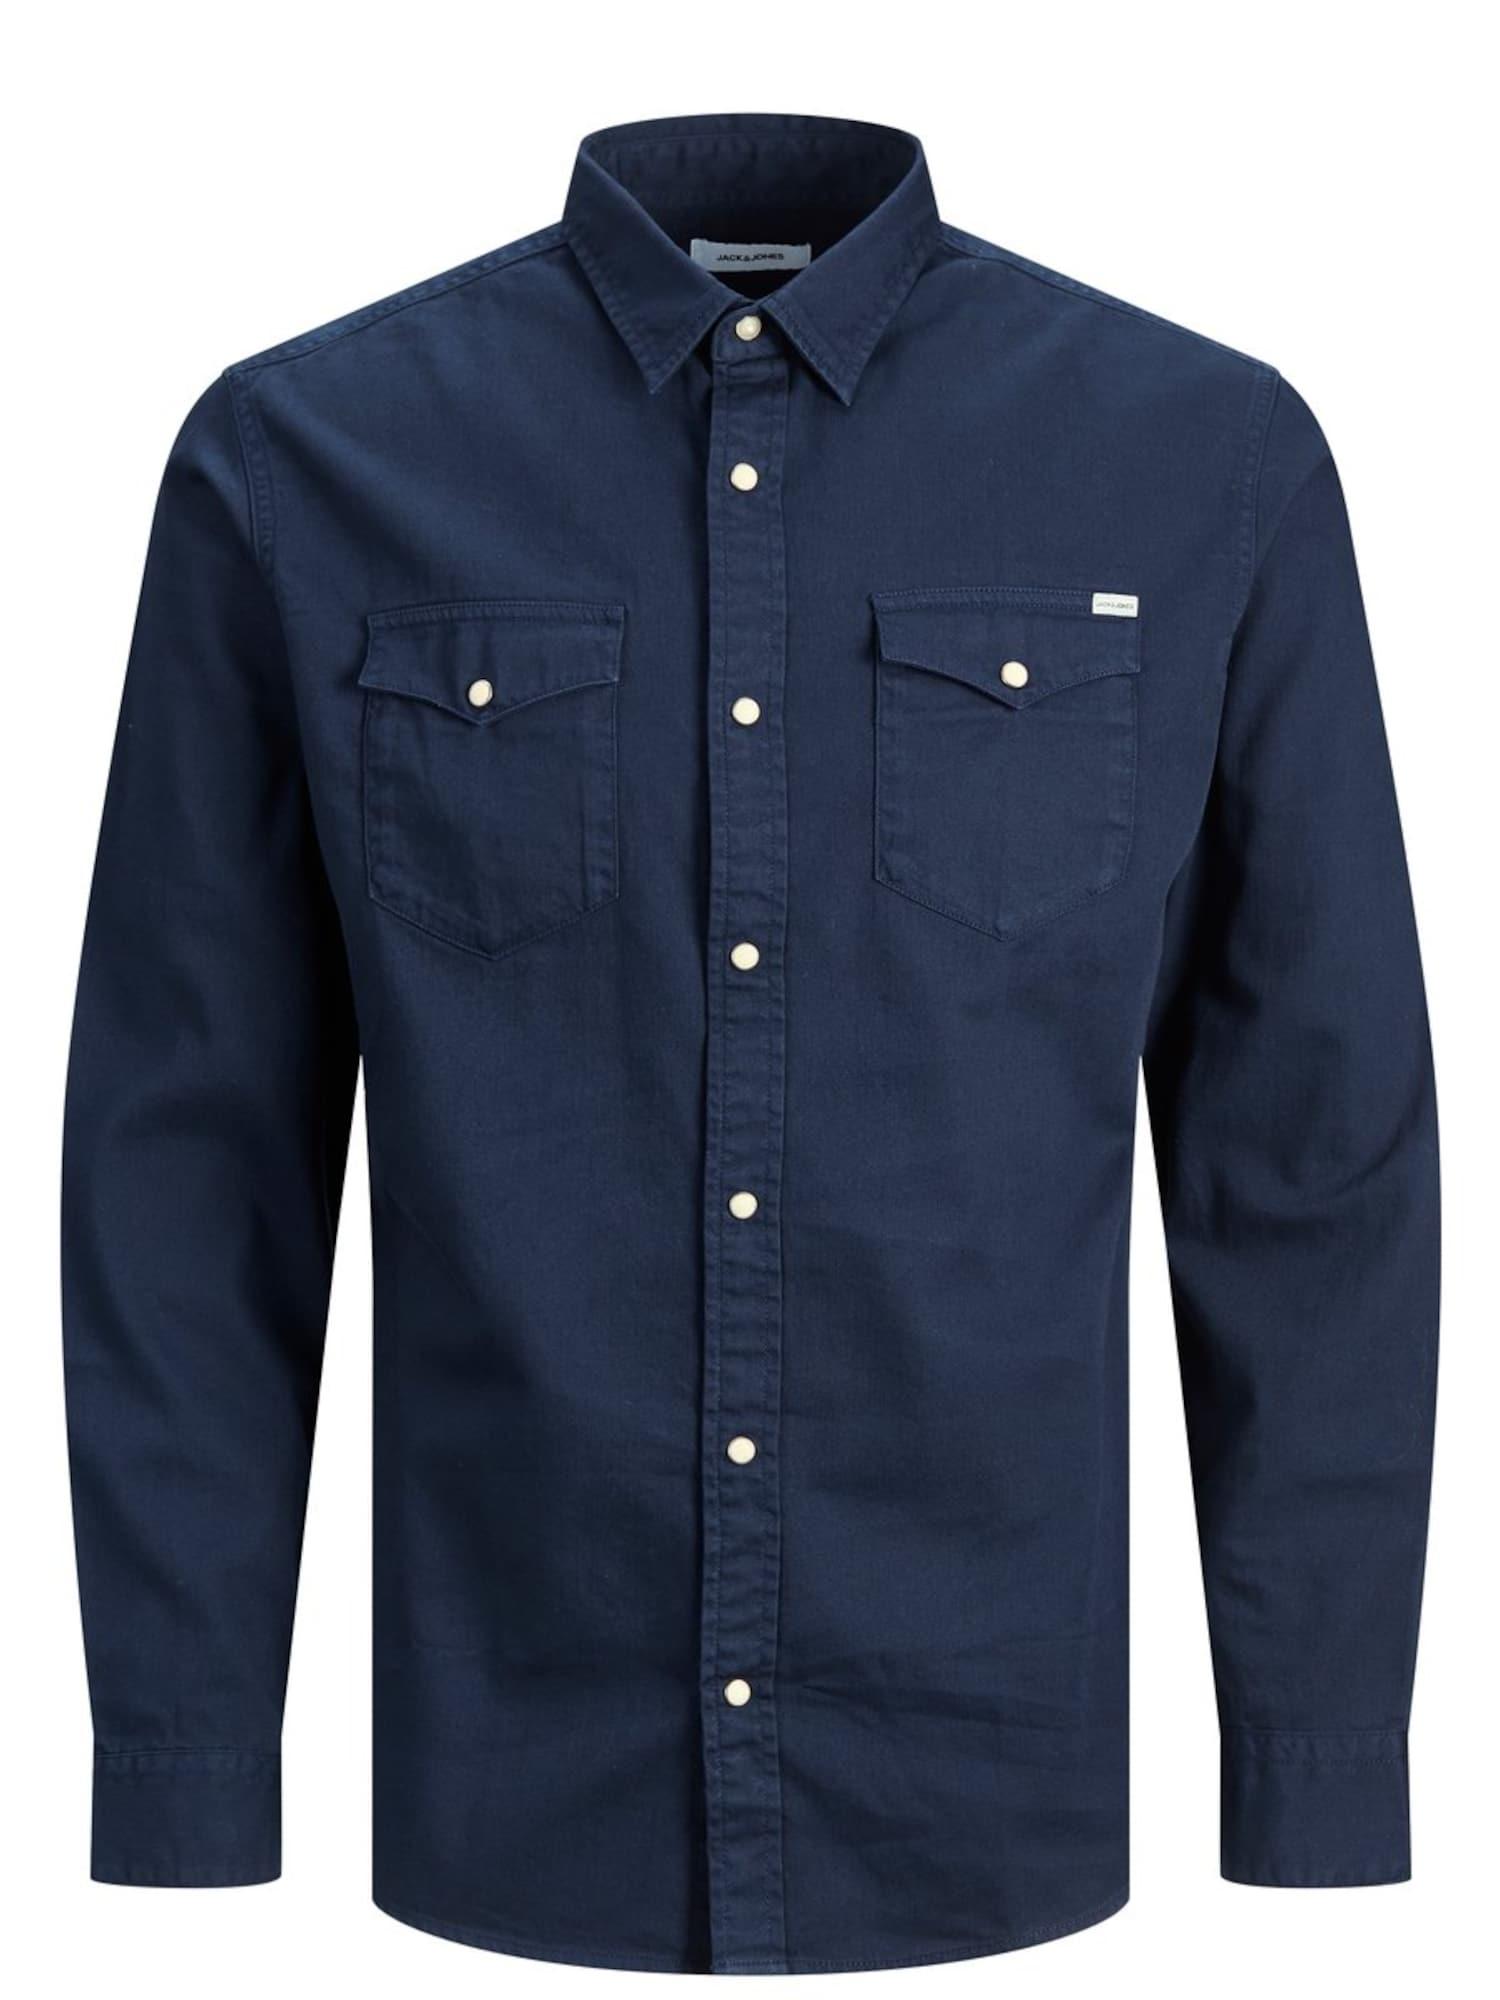 JACK & JONES Marškiniai nakties mėlyna